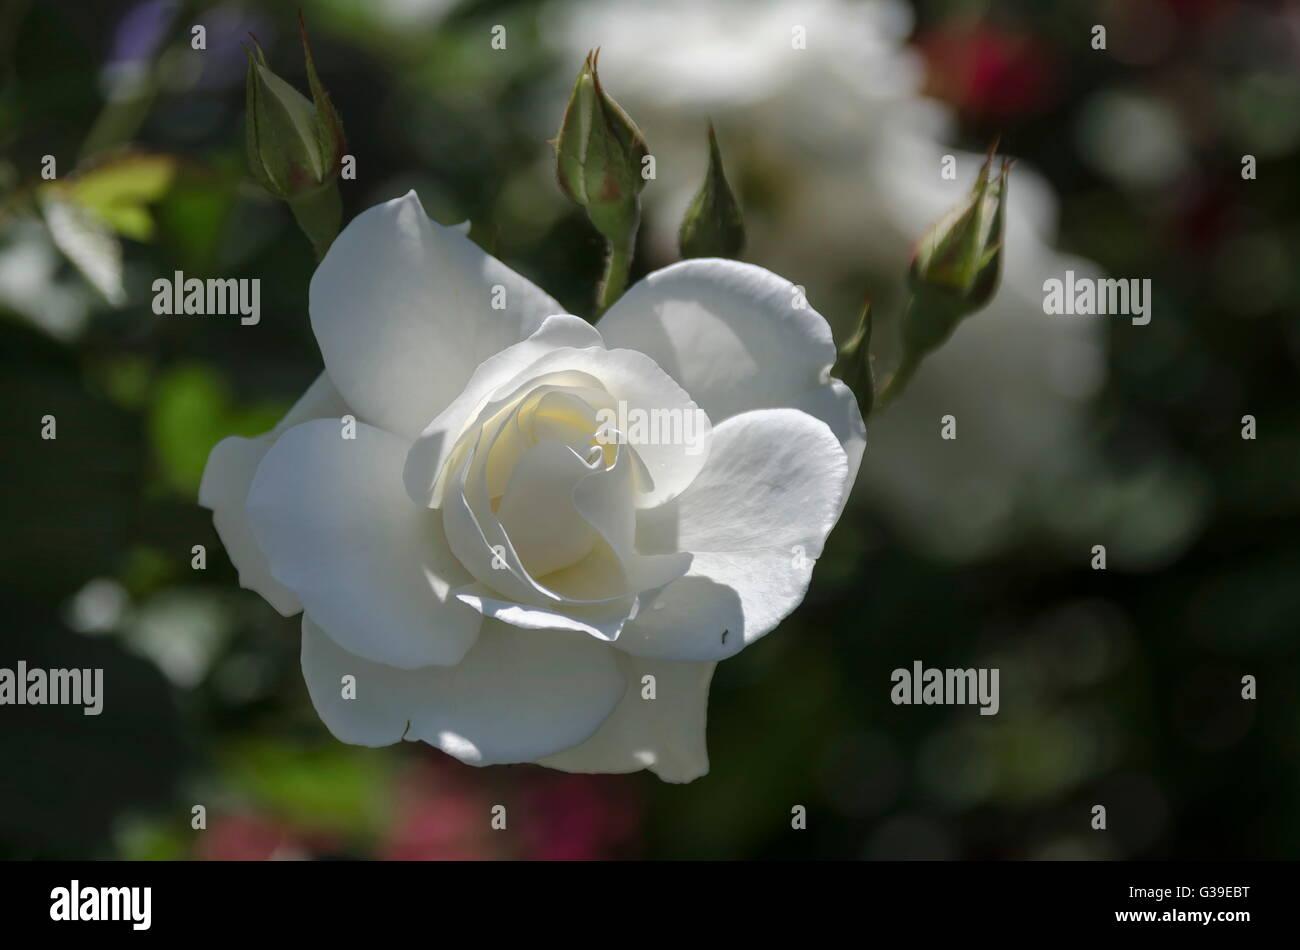 White Garden Rose Bush white rose bush in bloom at natural outdoor garden, sofia